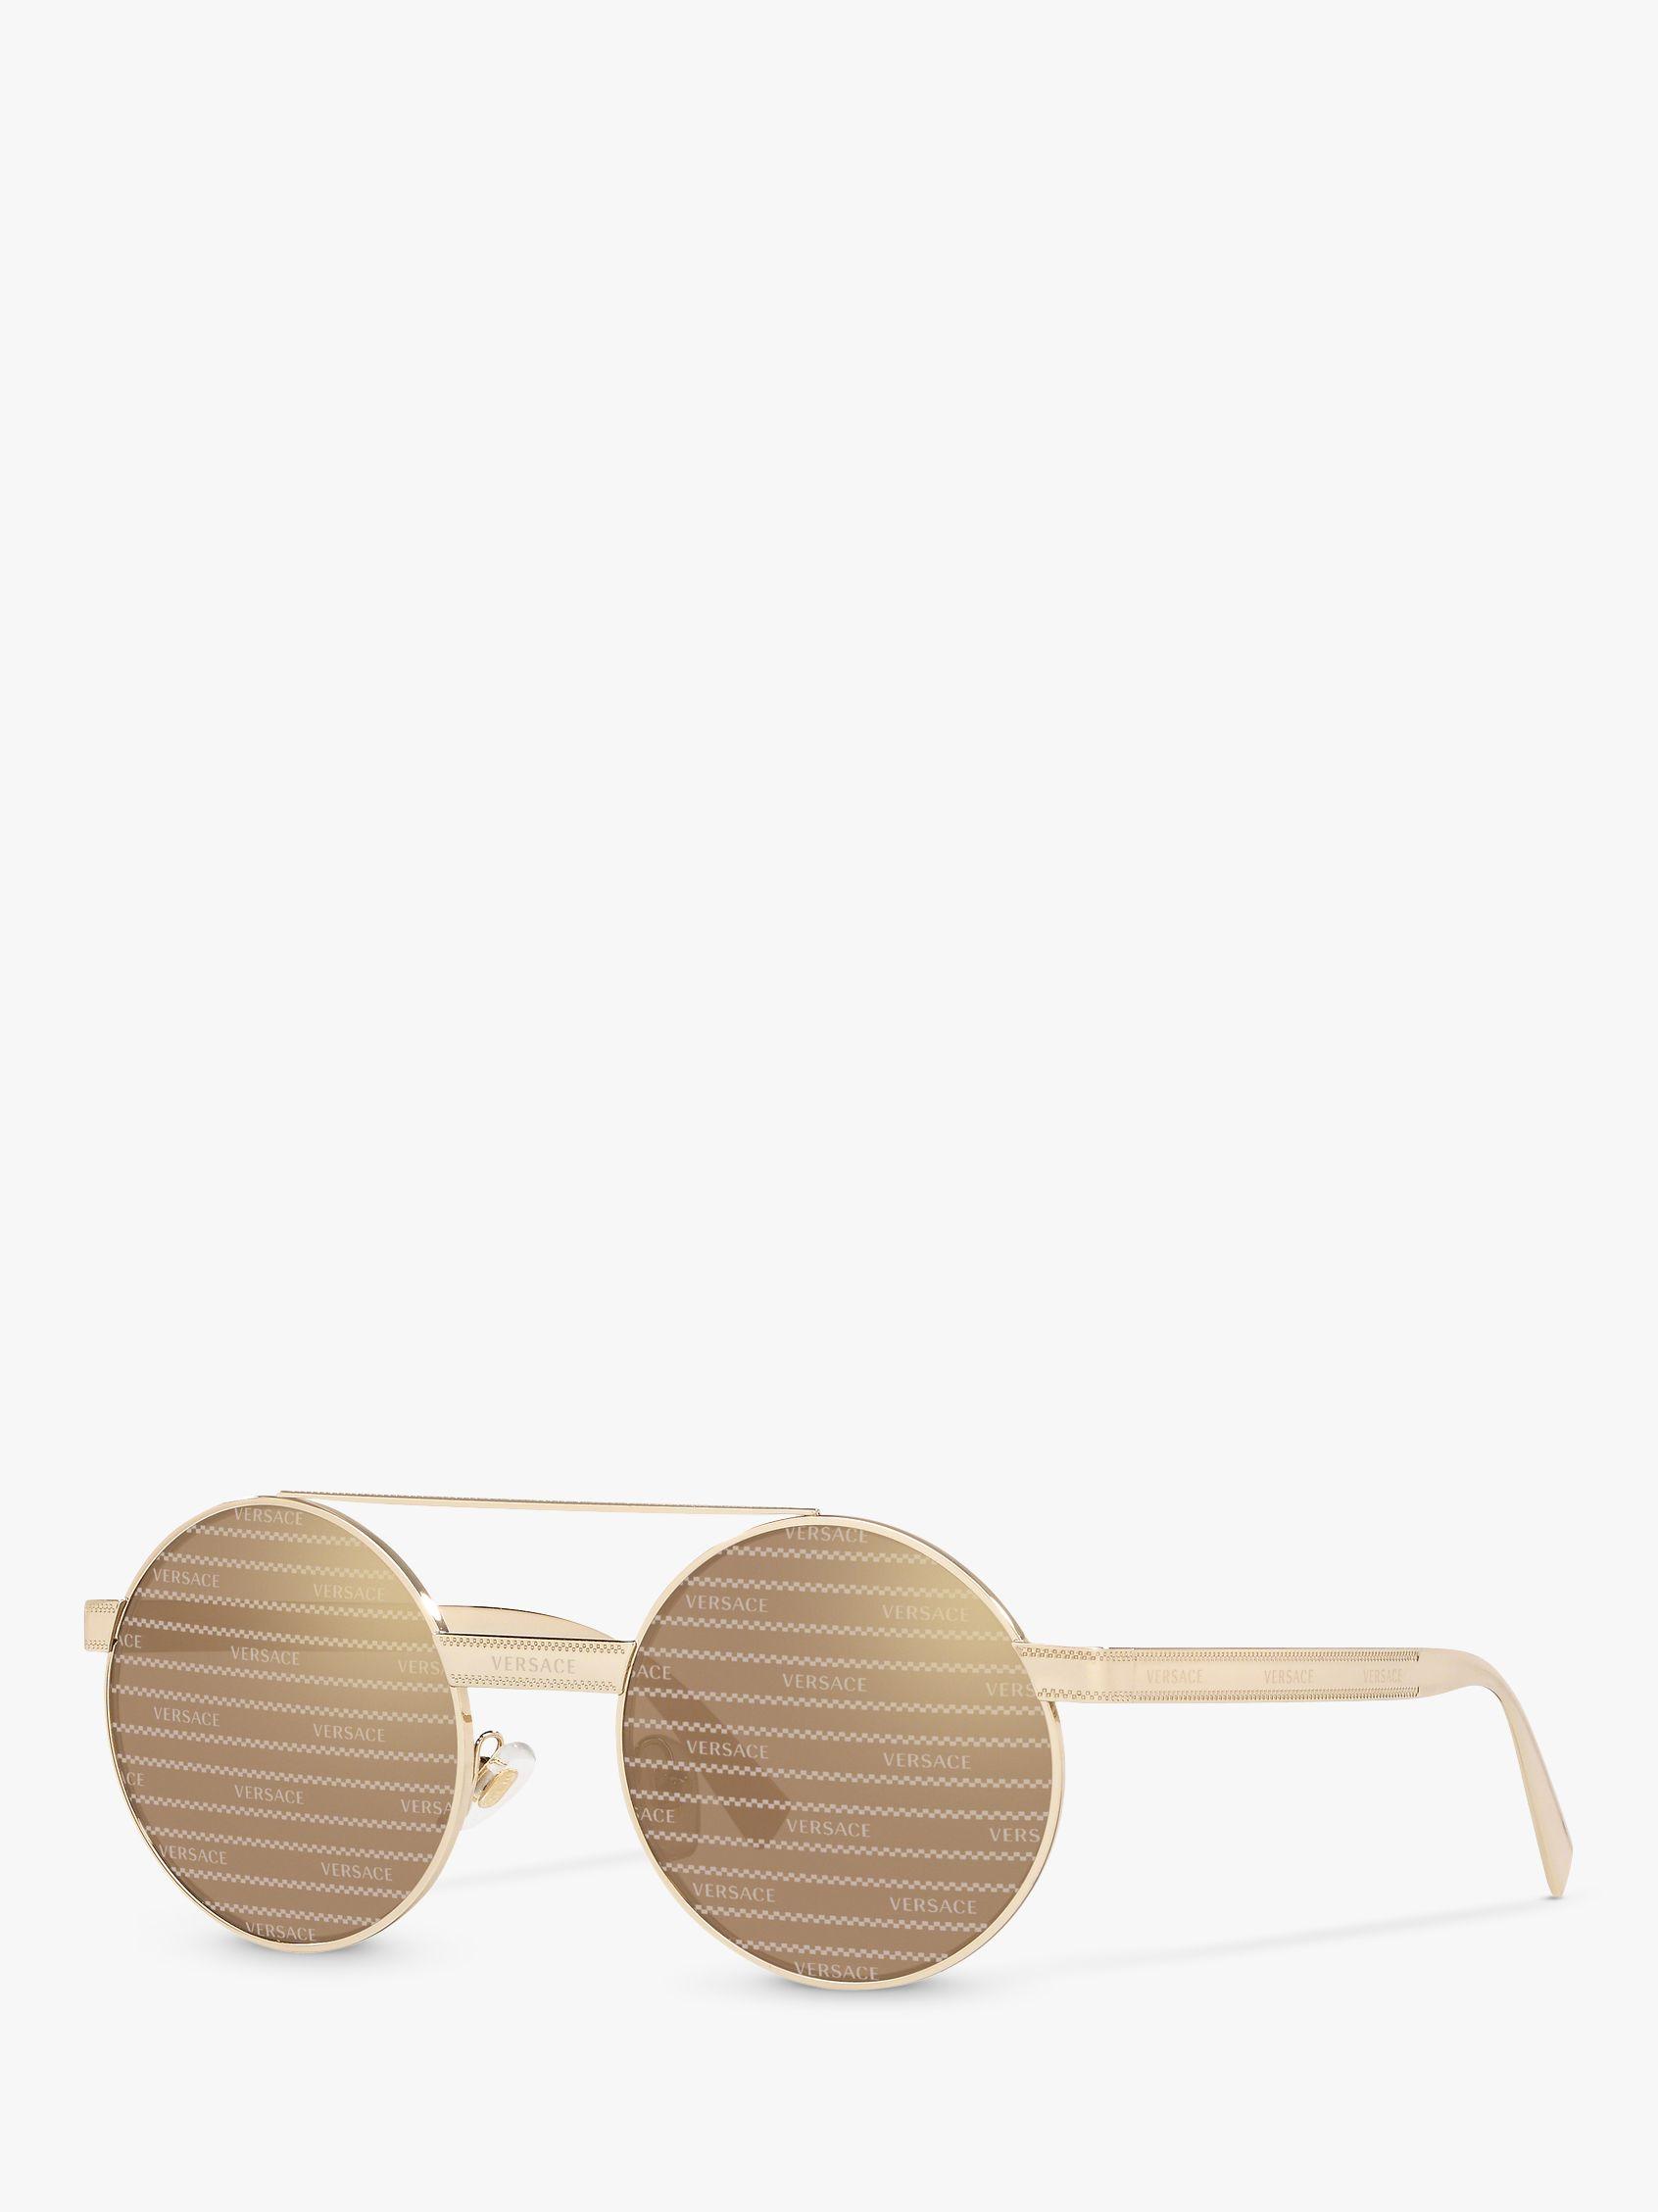 Versace Versace VE2210 Women's Round Sunglasses, Gold/Brown